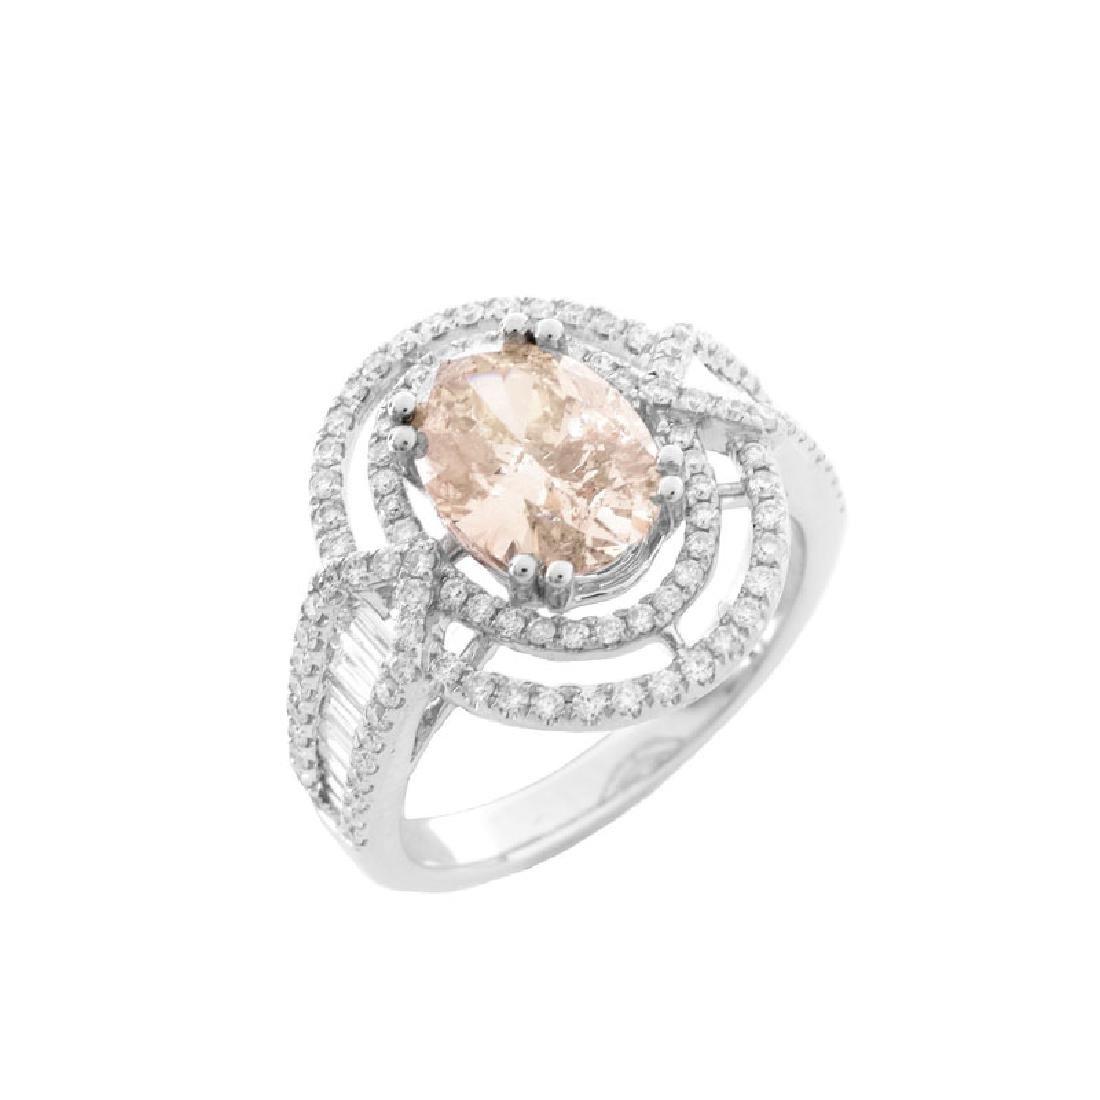 Approx. 1.71 Carat Oval Cut Diamond and 14 Karat White